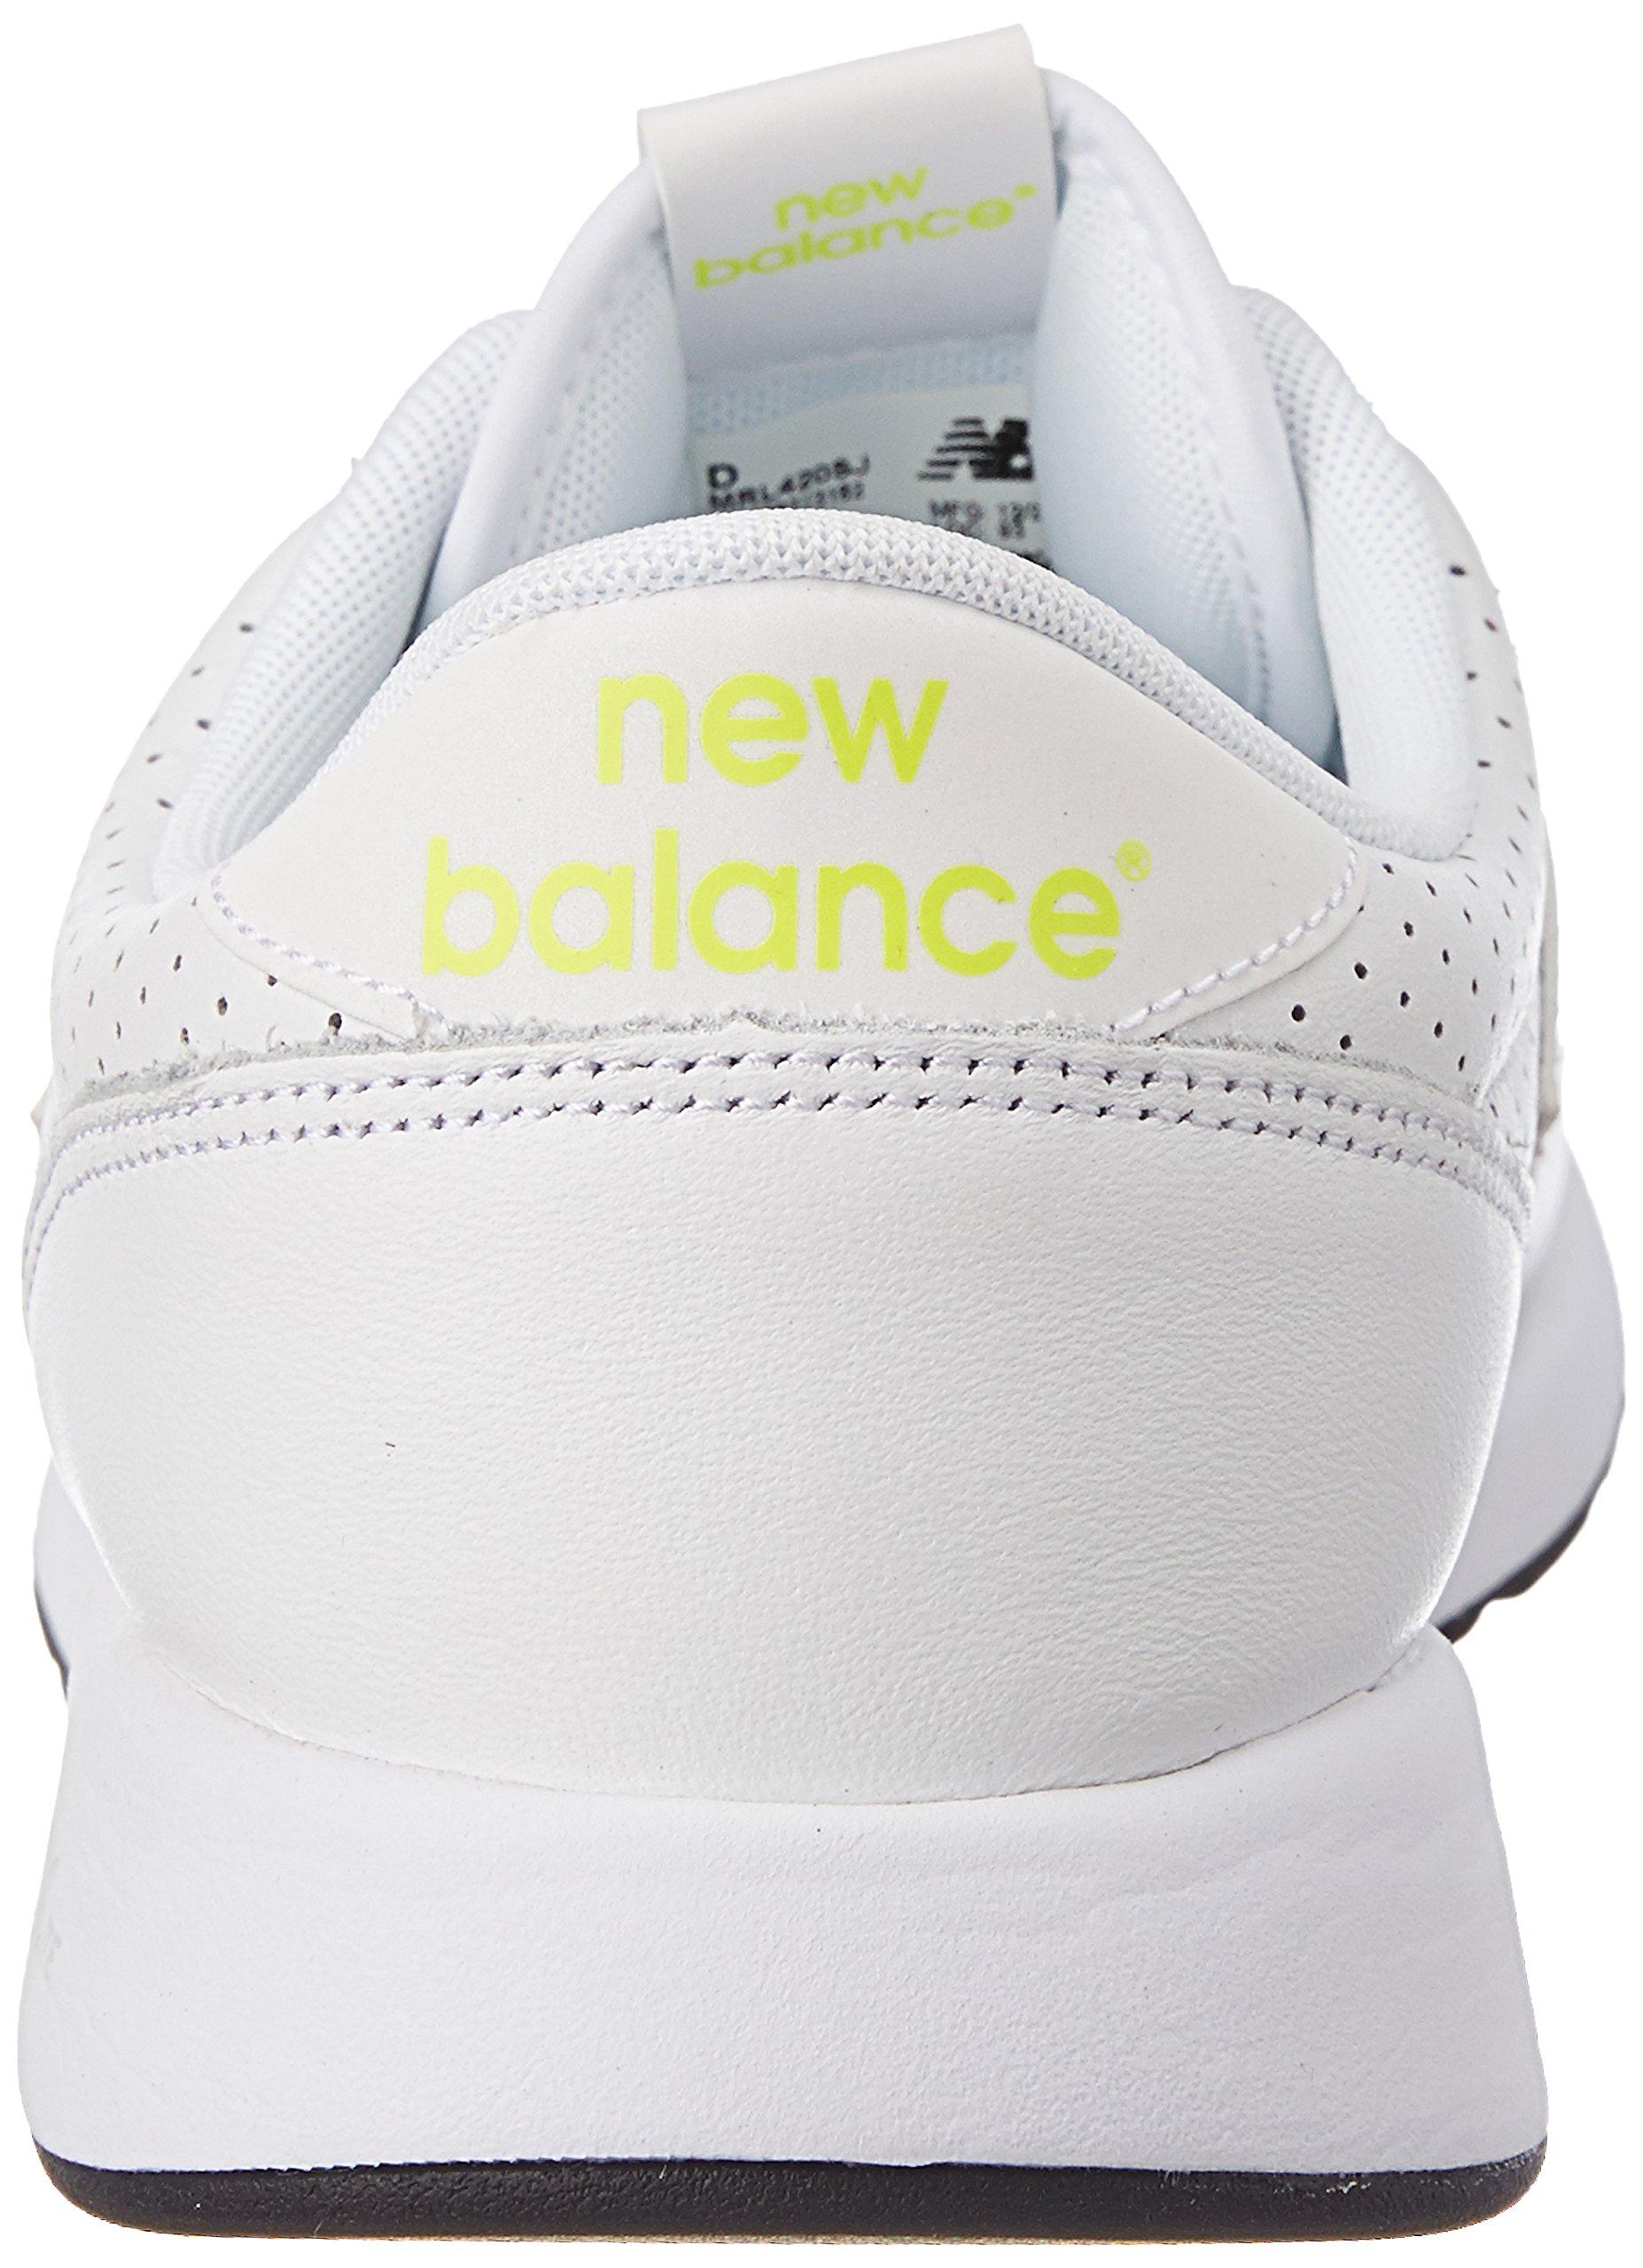 Scarpa New Balance grau MRL420 grau Balance Scarpa New Balance MRL420 MRL420 grau Scarpa New New 5pgtqq